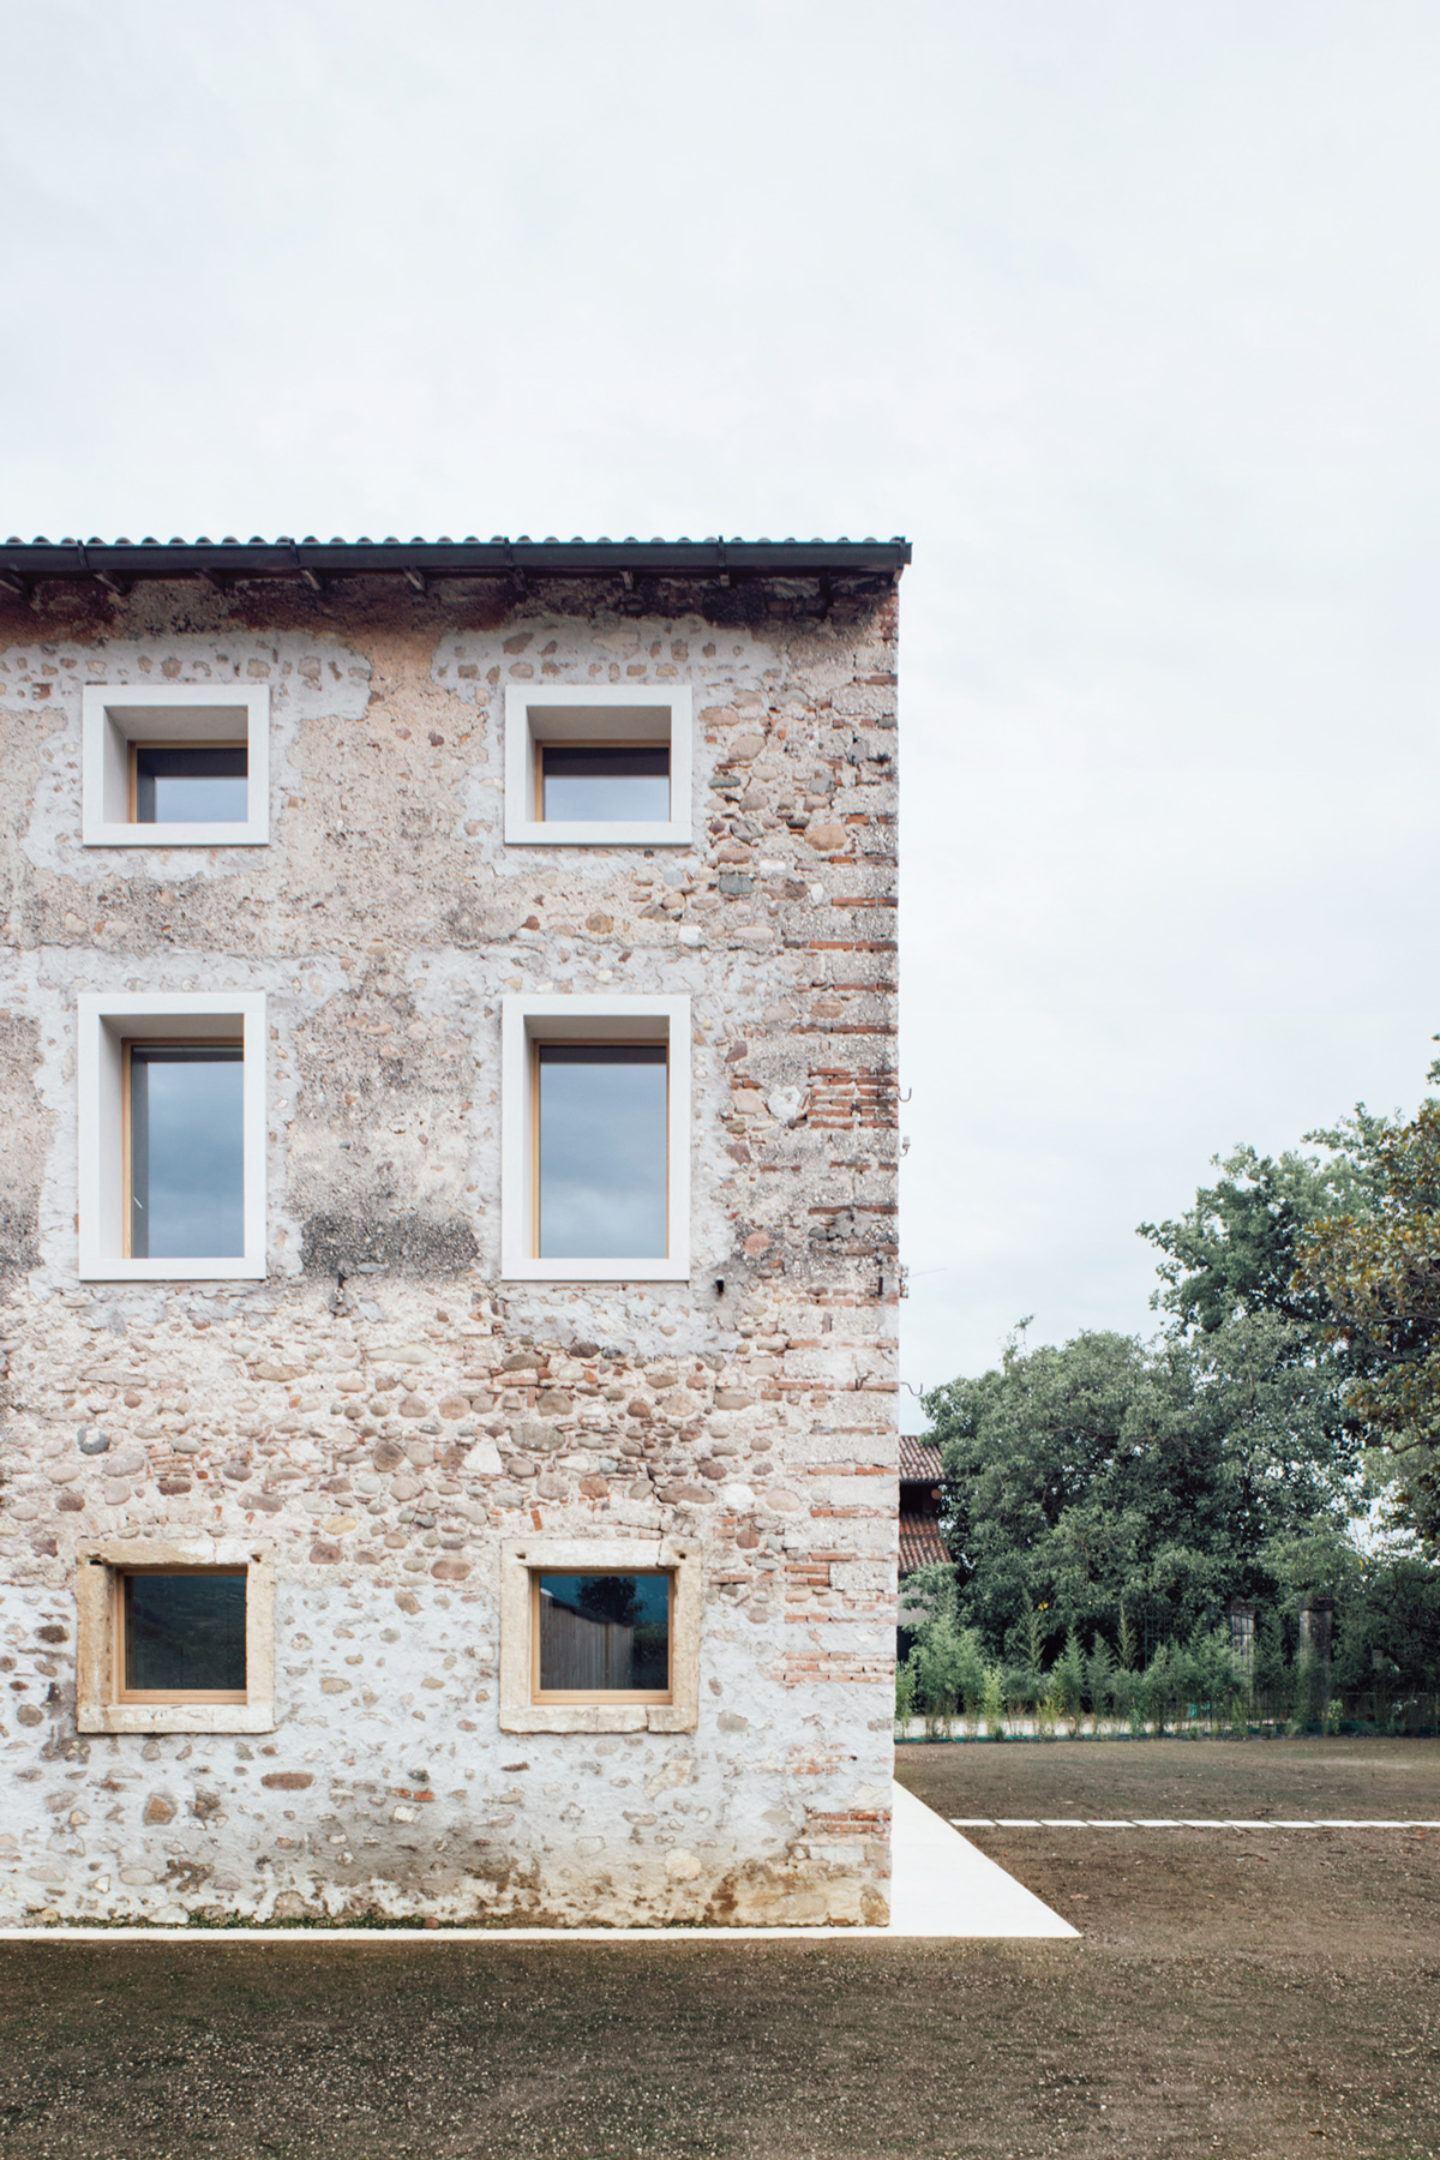 IGNANT-Architecture-Studio-Wok-Country-Home-In-Chievo-3